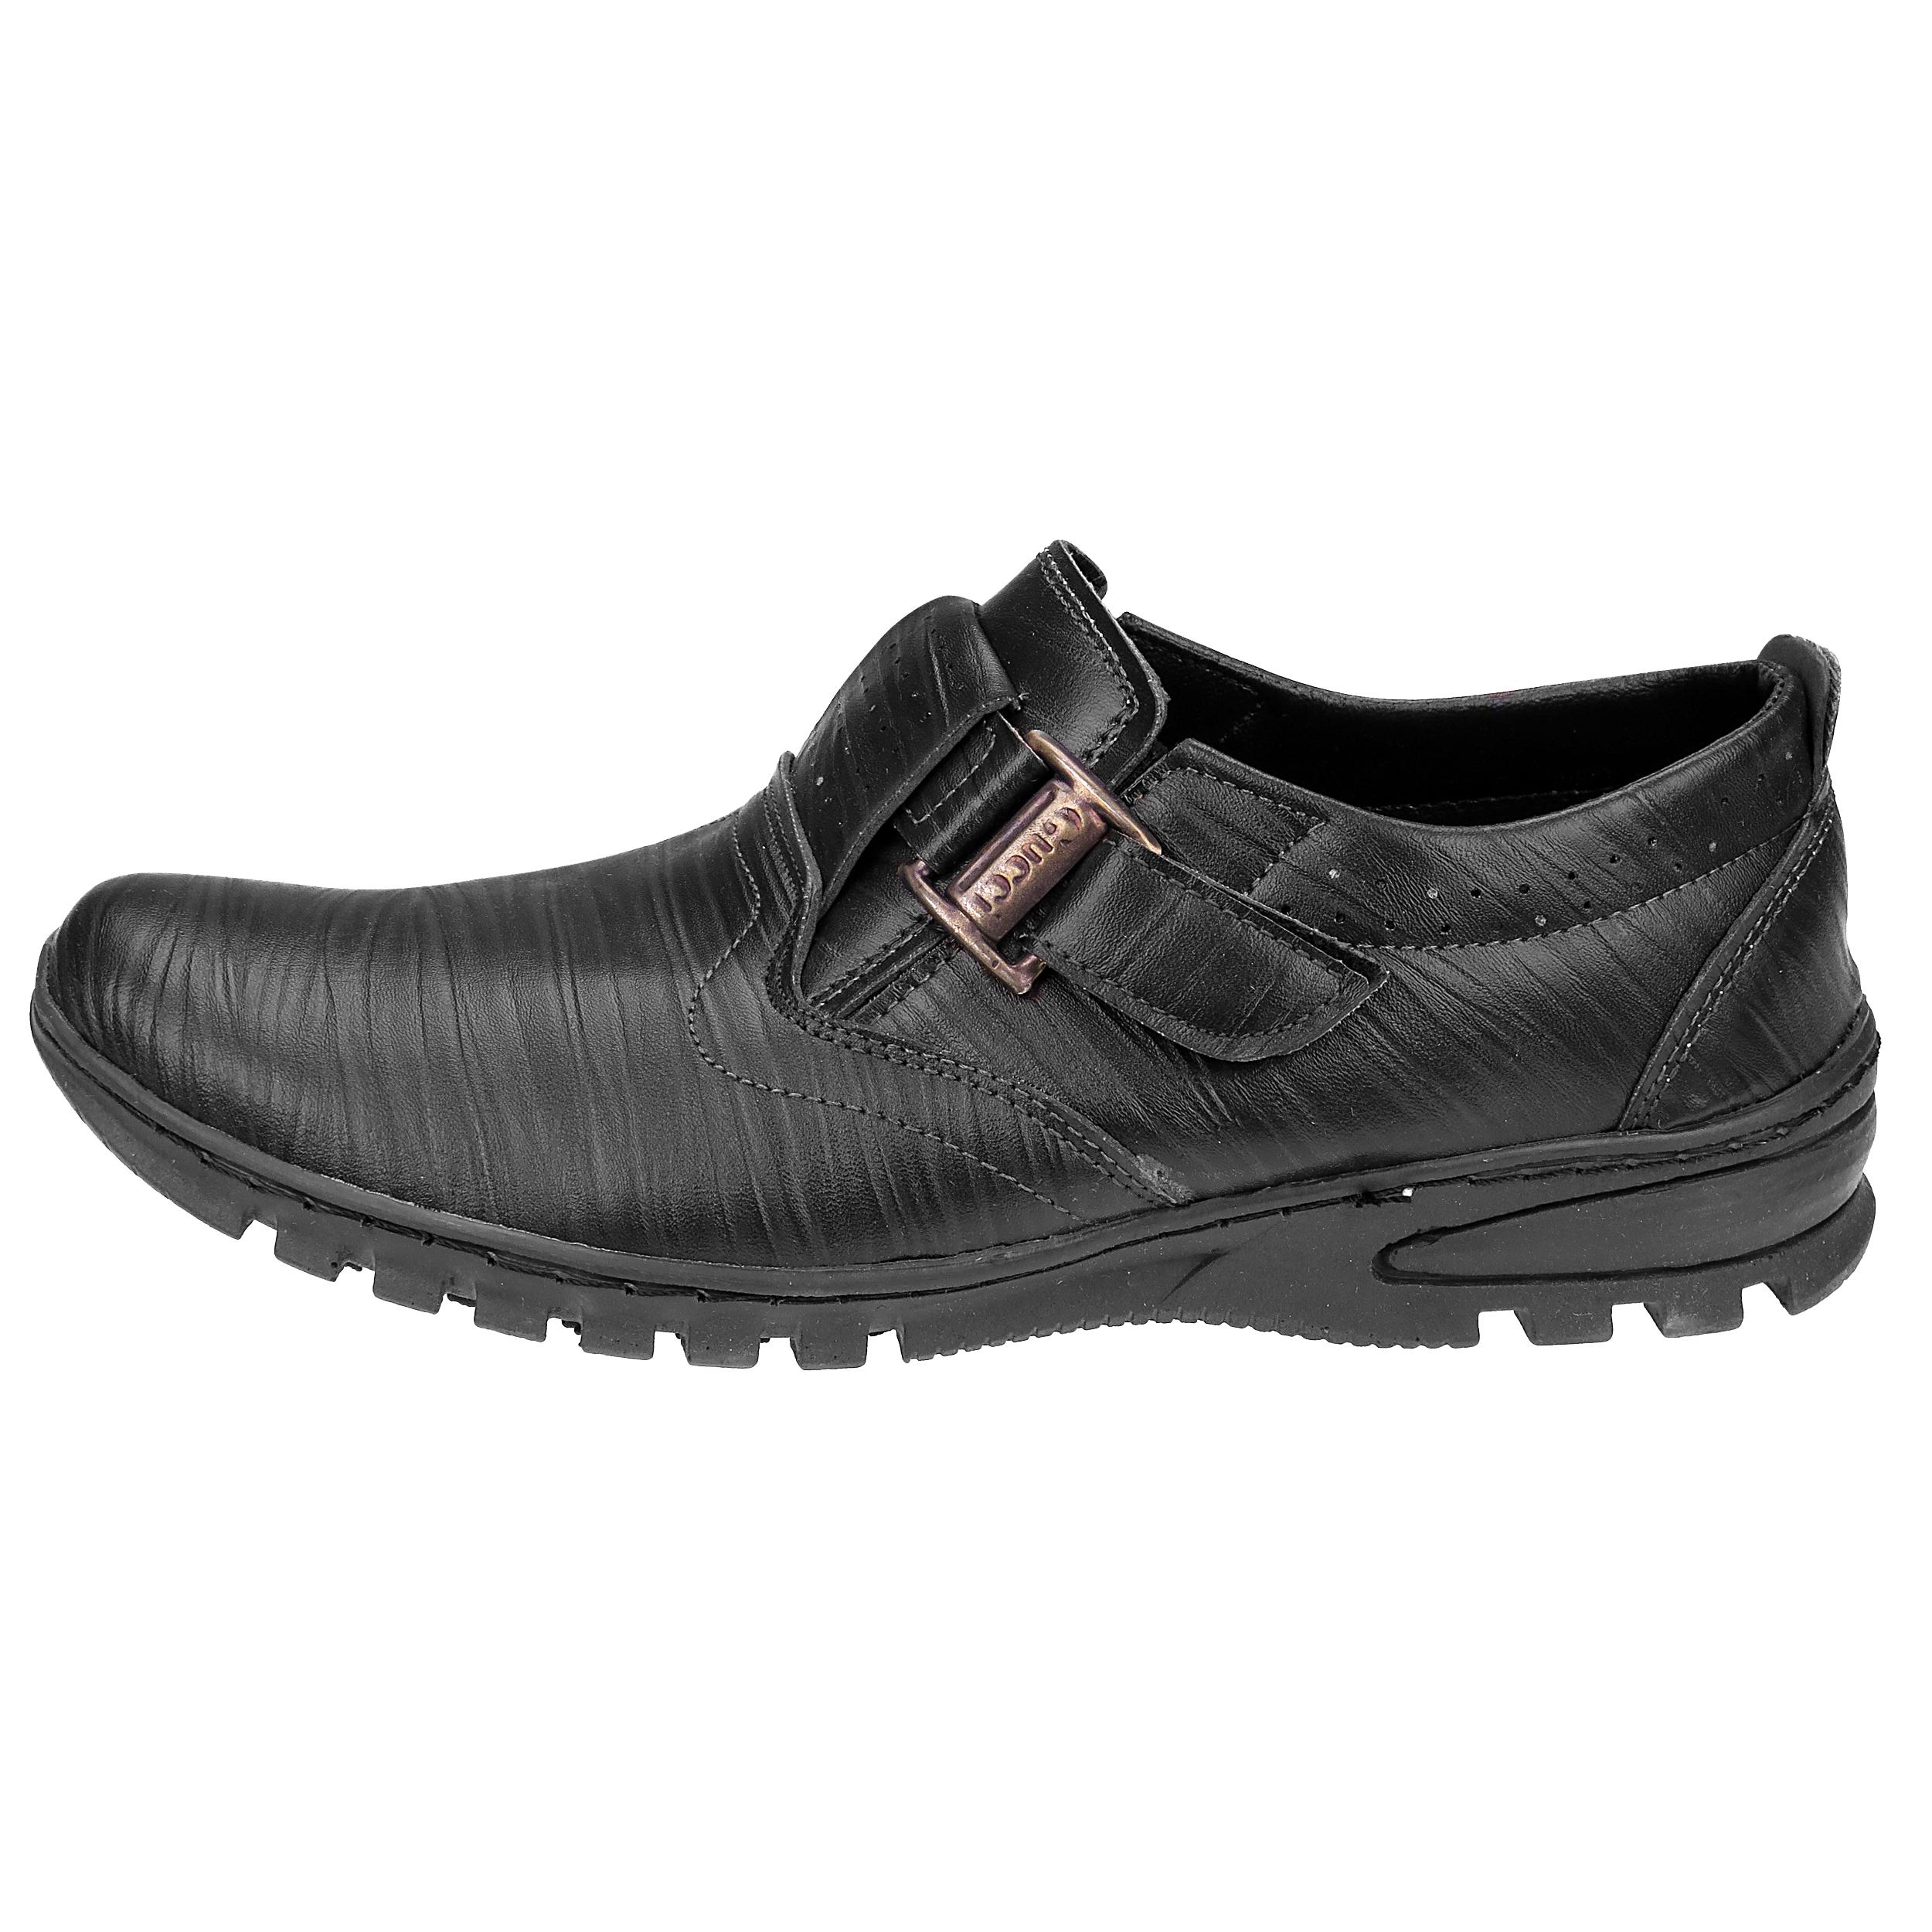 کفش روزمره مردانه مدل 66003